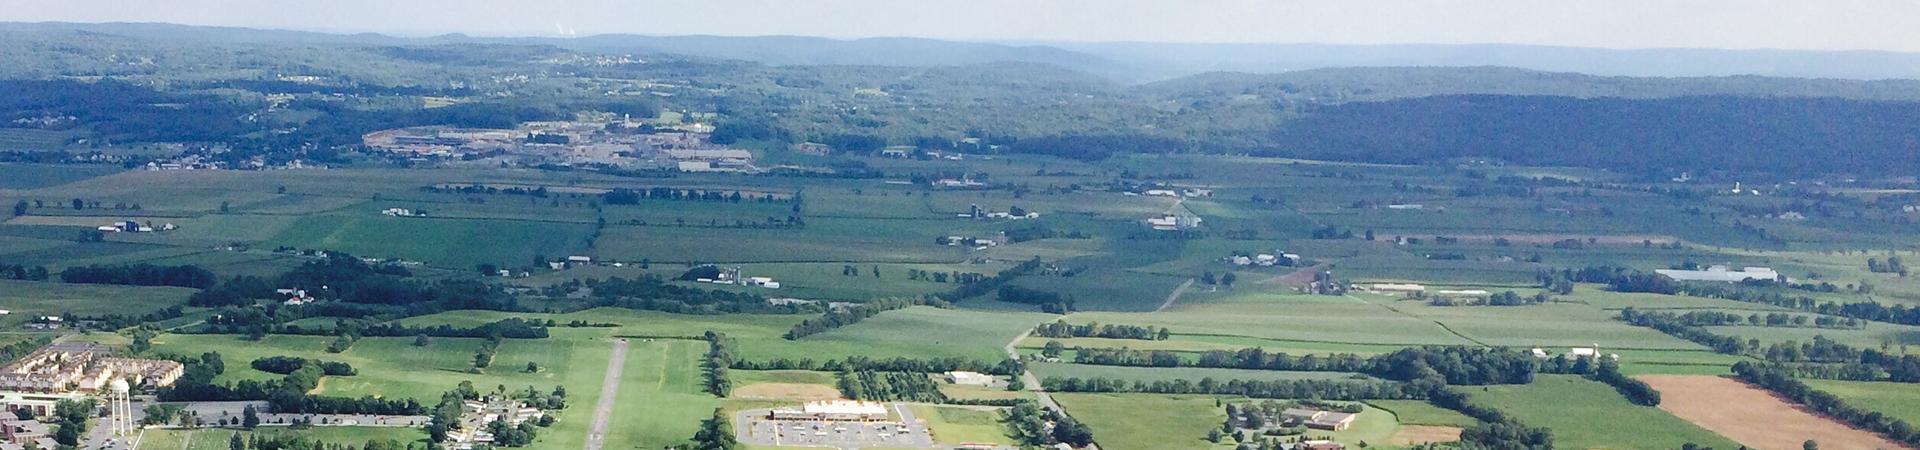 Rural landscape in Pennsylvania